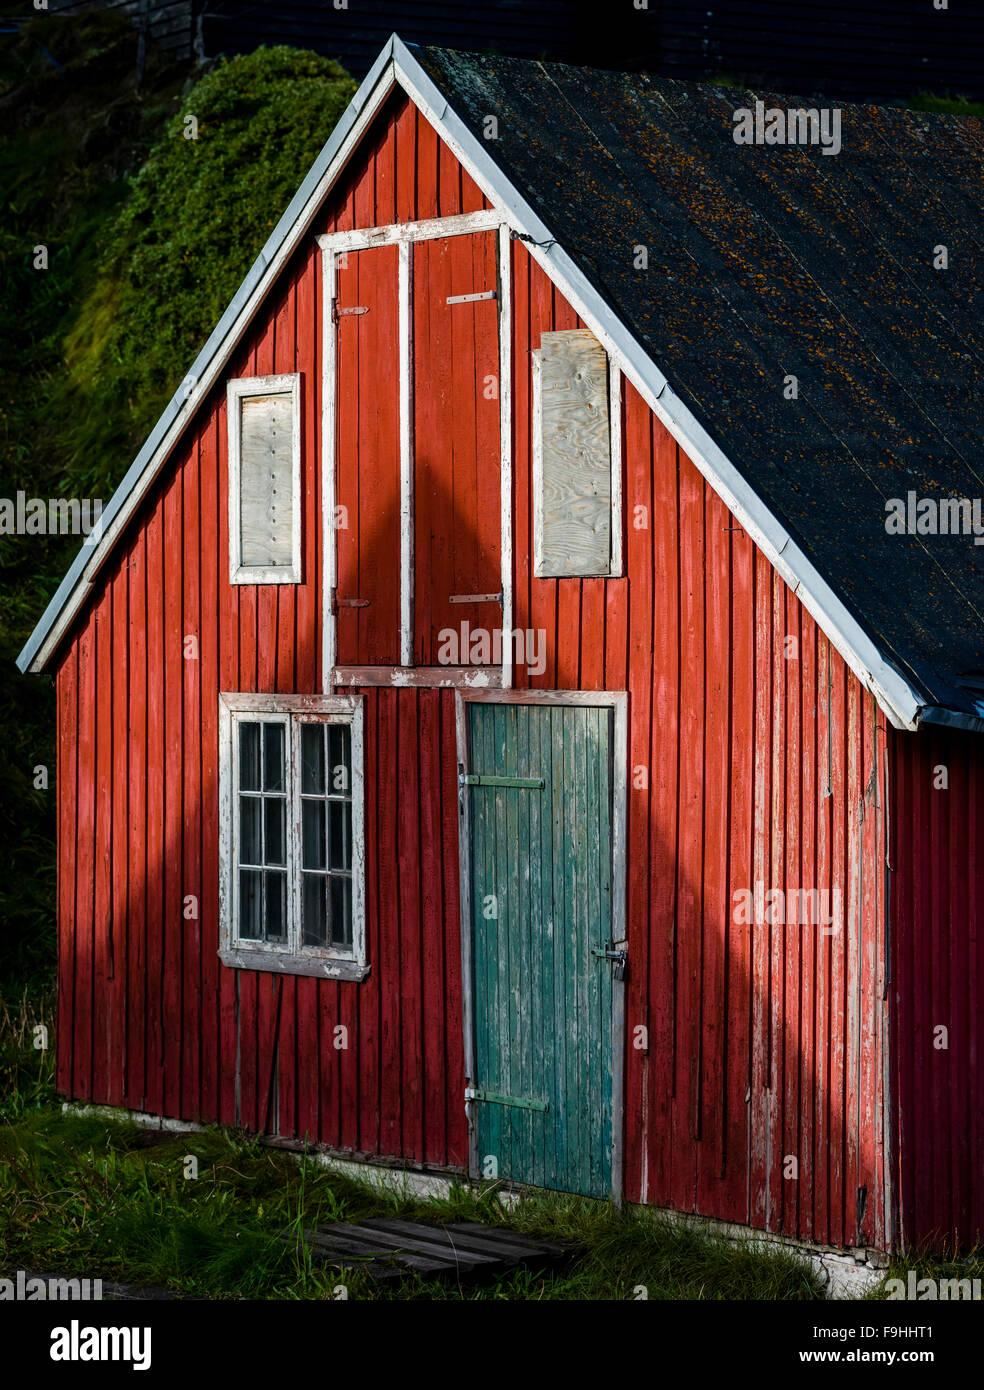 SISIMIUT       GREENLAND - Stock Image